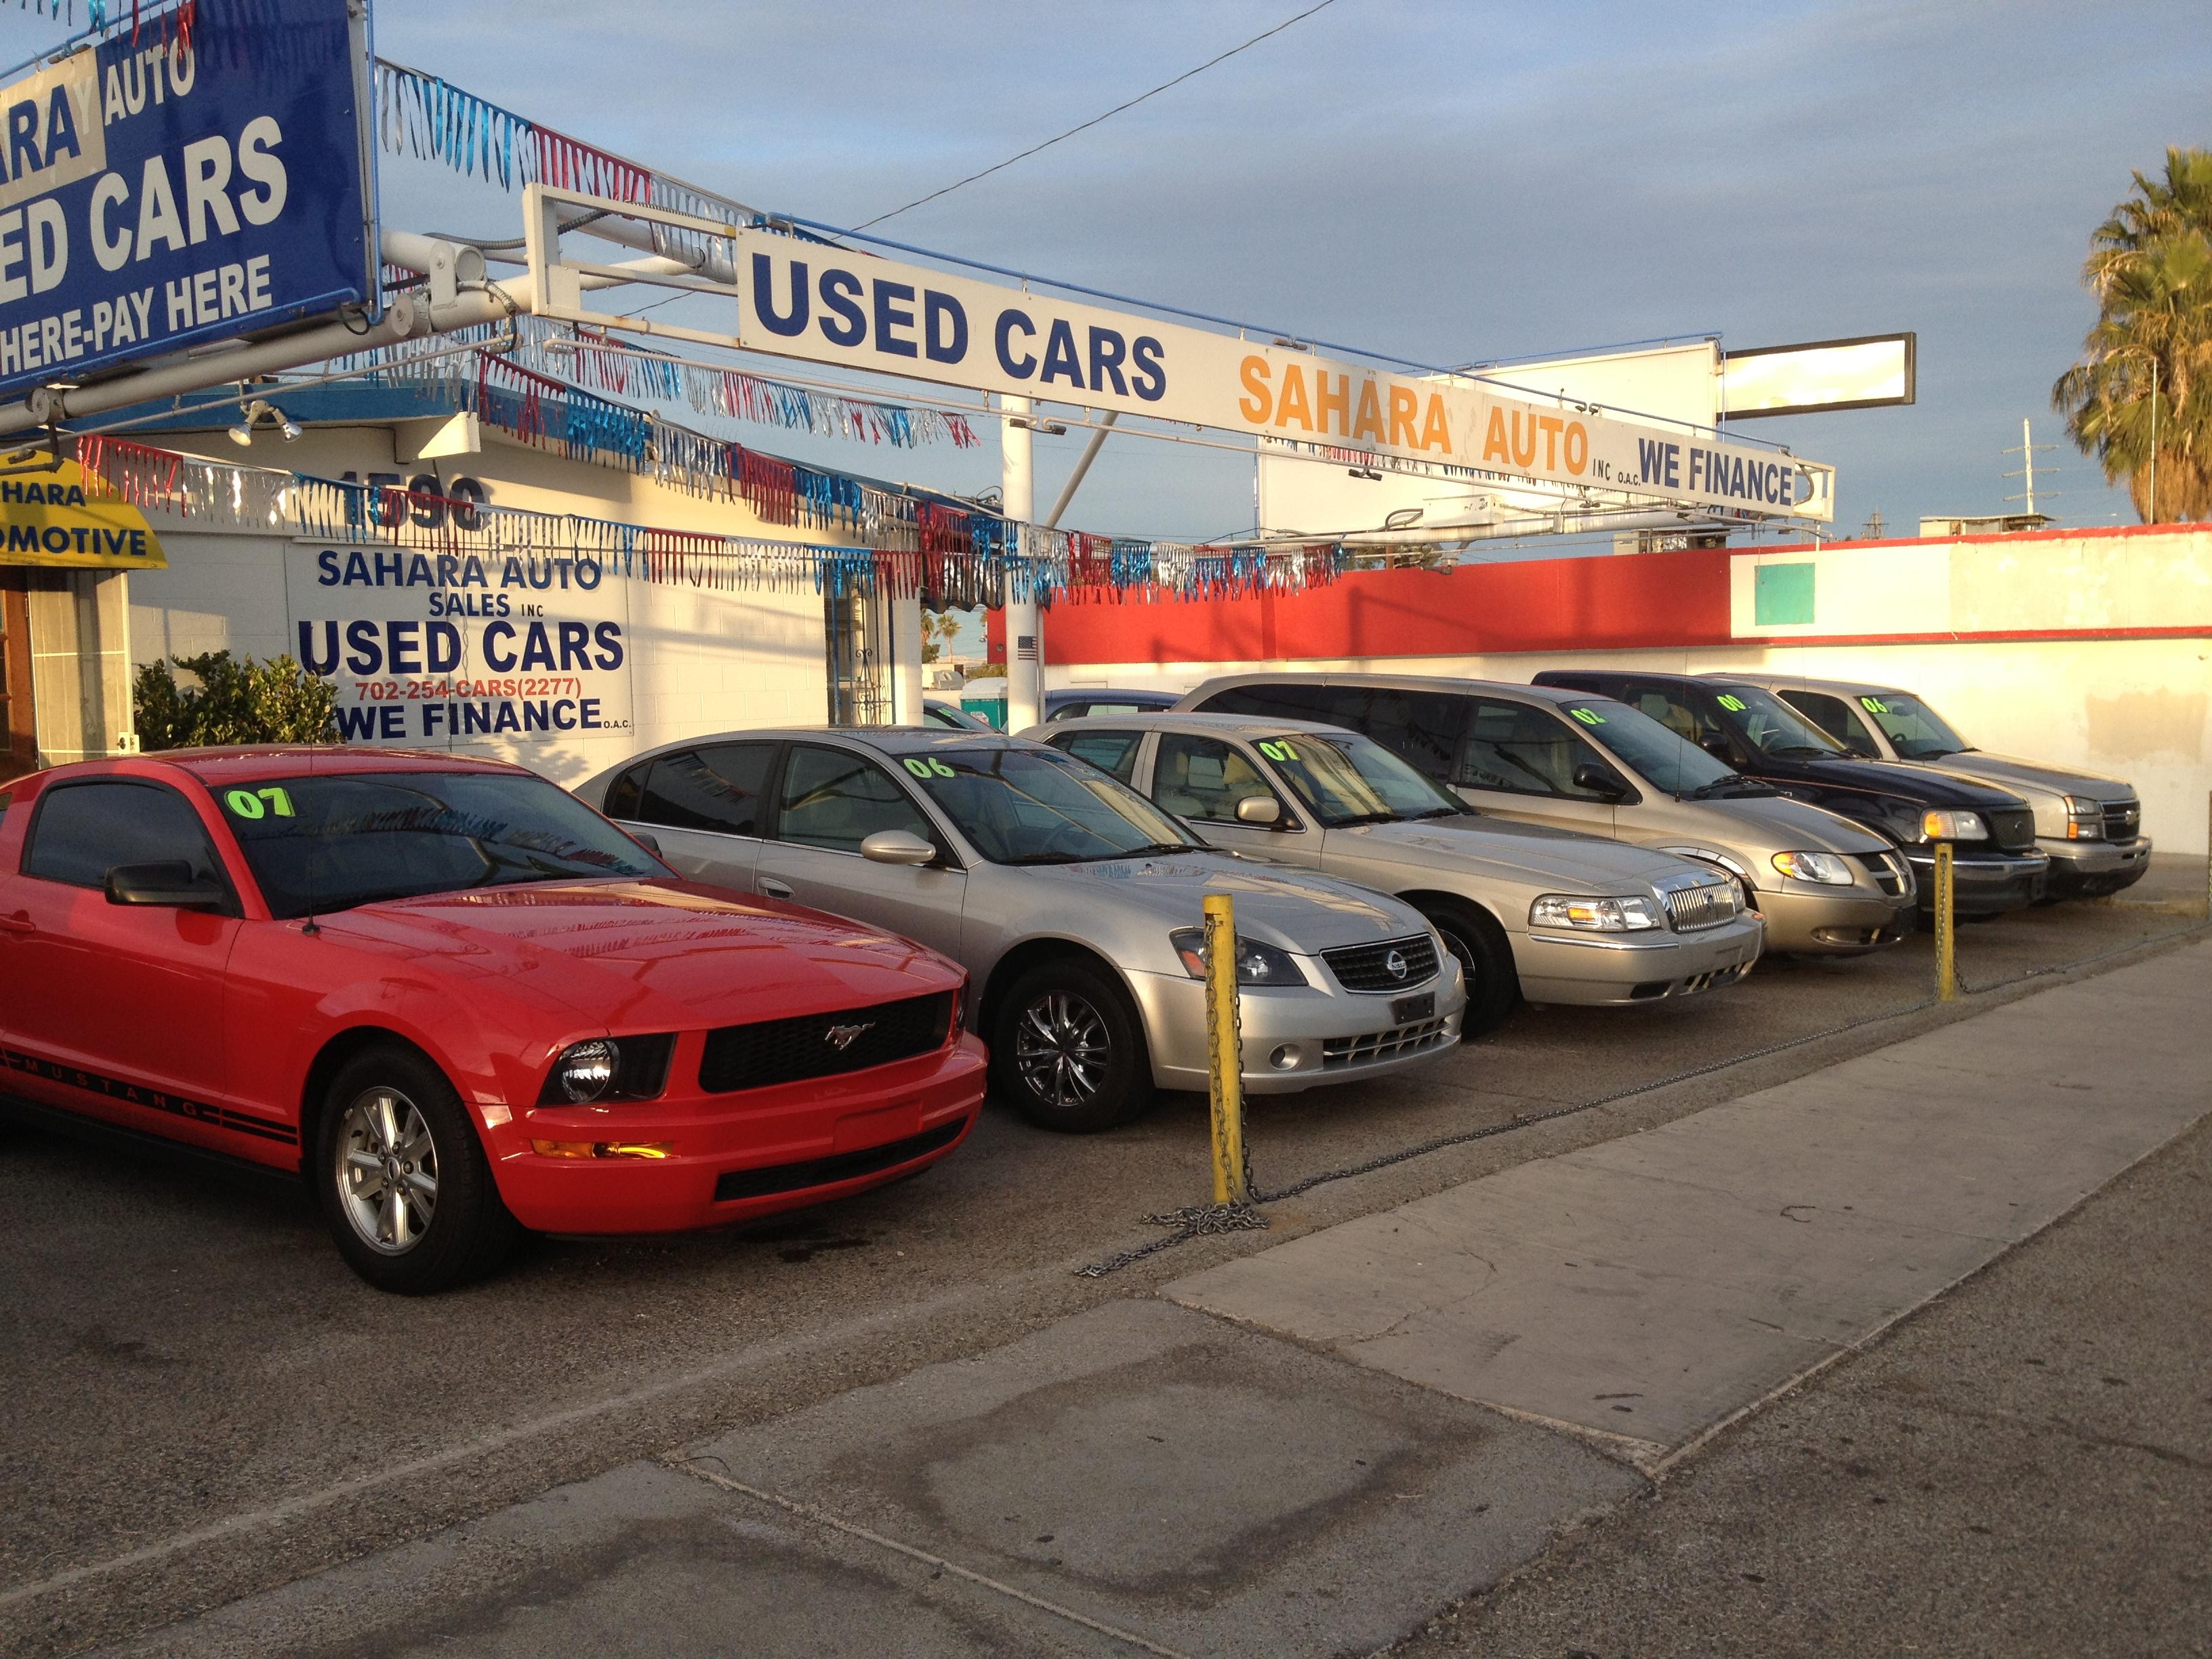 Sahara Auto Sales 1590 E Sahara Ave Las Vegas NV YP